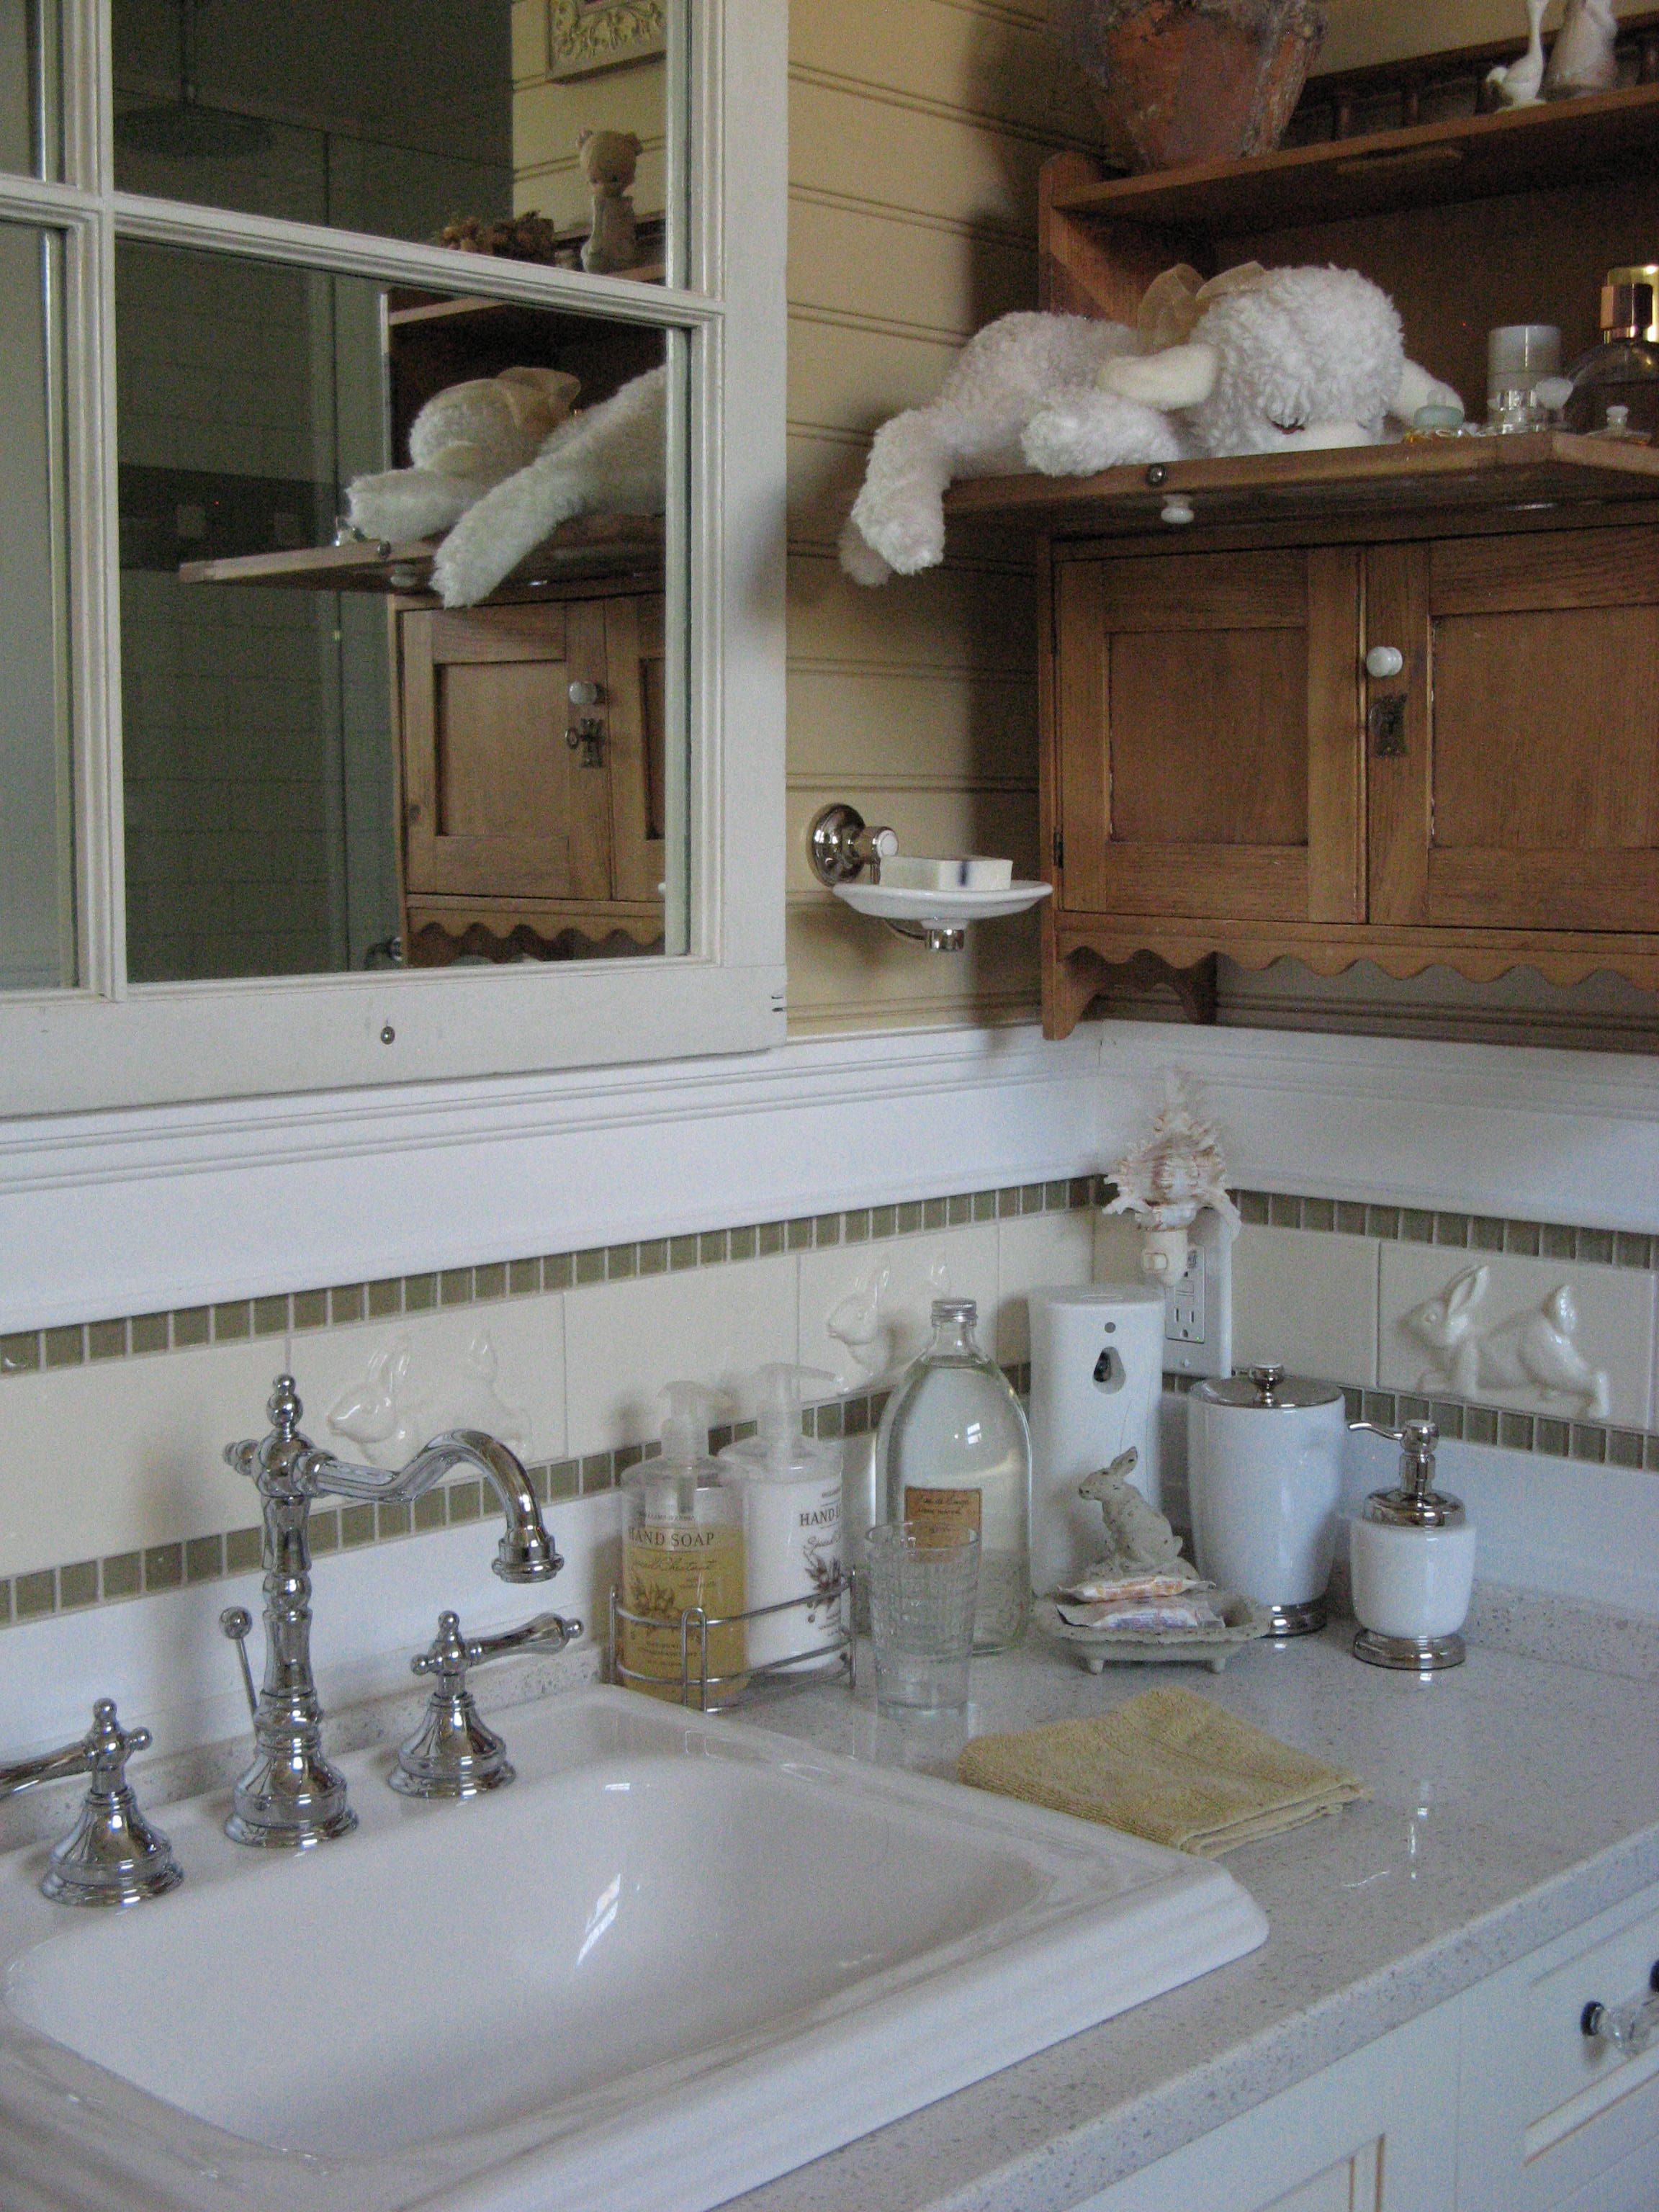 Ensuite Bathroom with Toto Sink and Riobel Faucets Bathroom